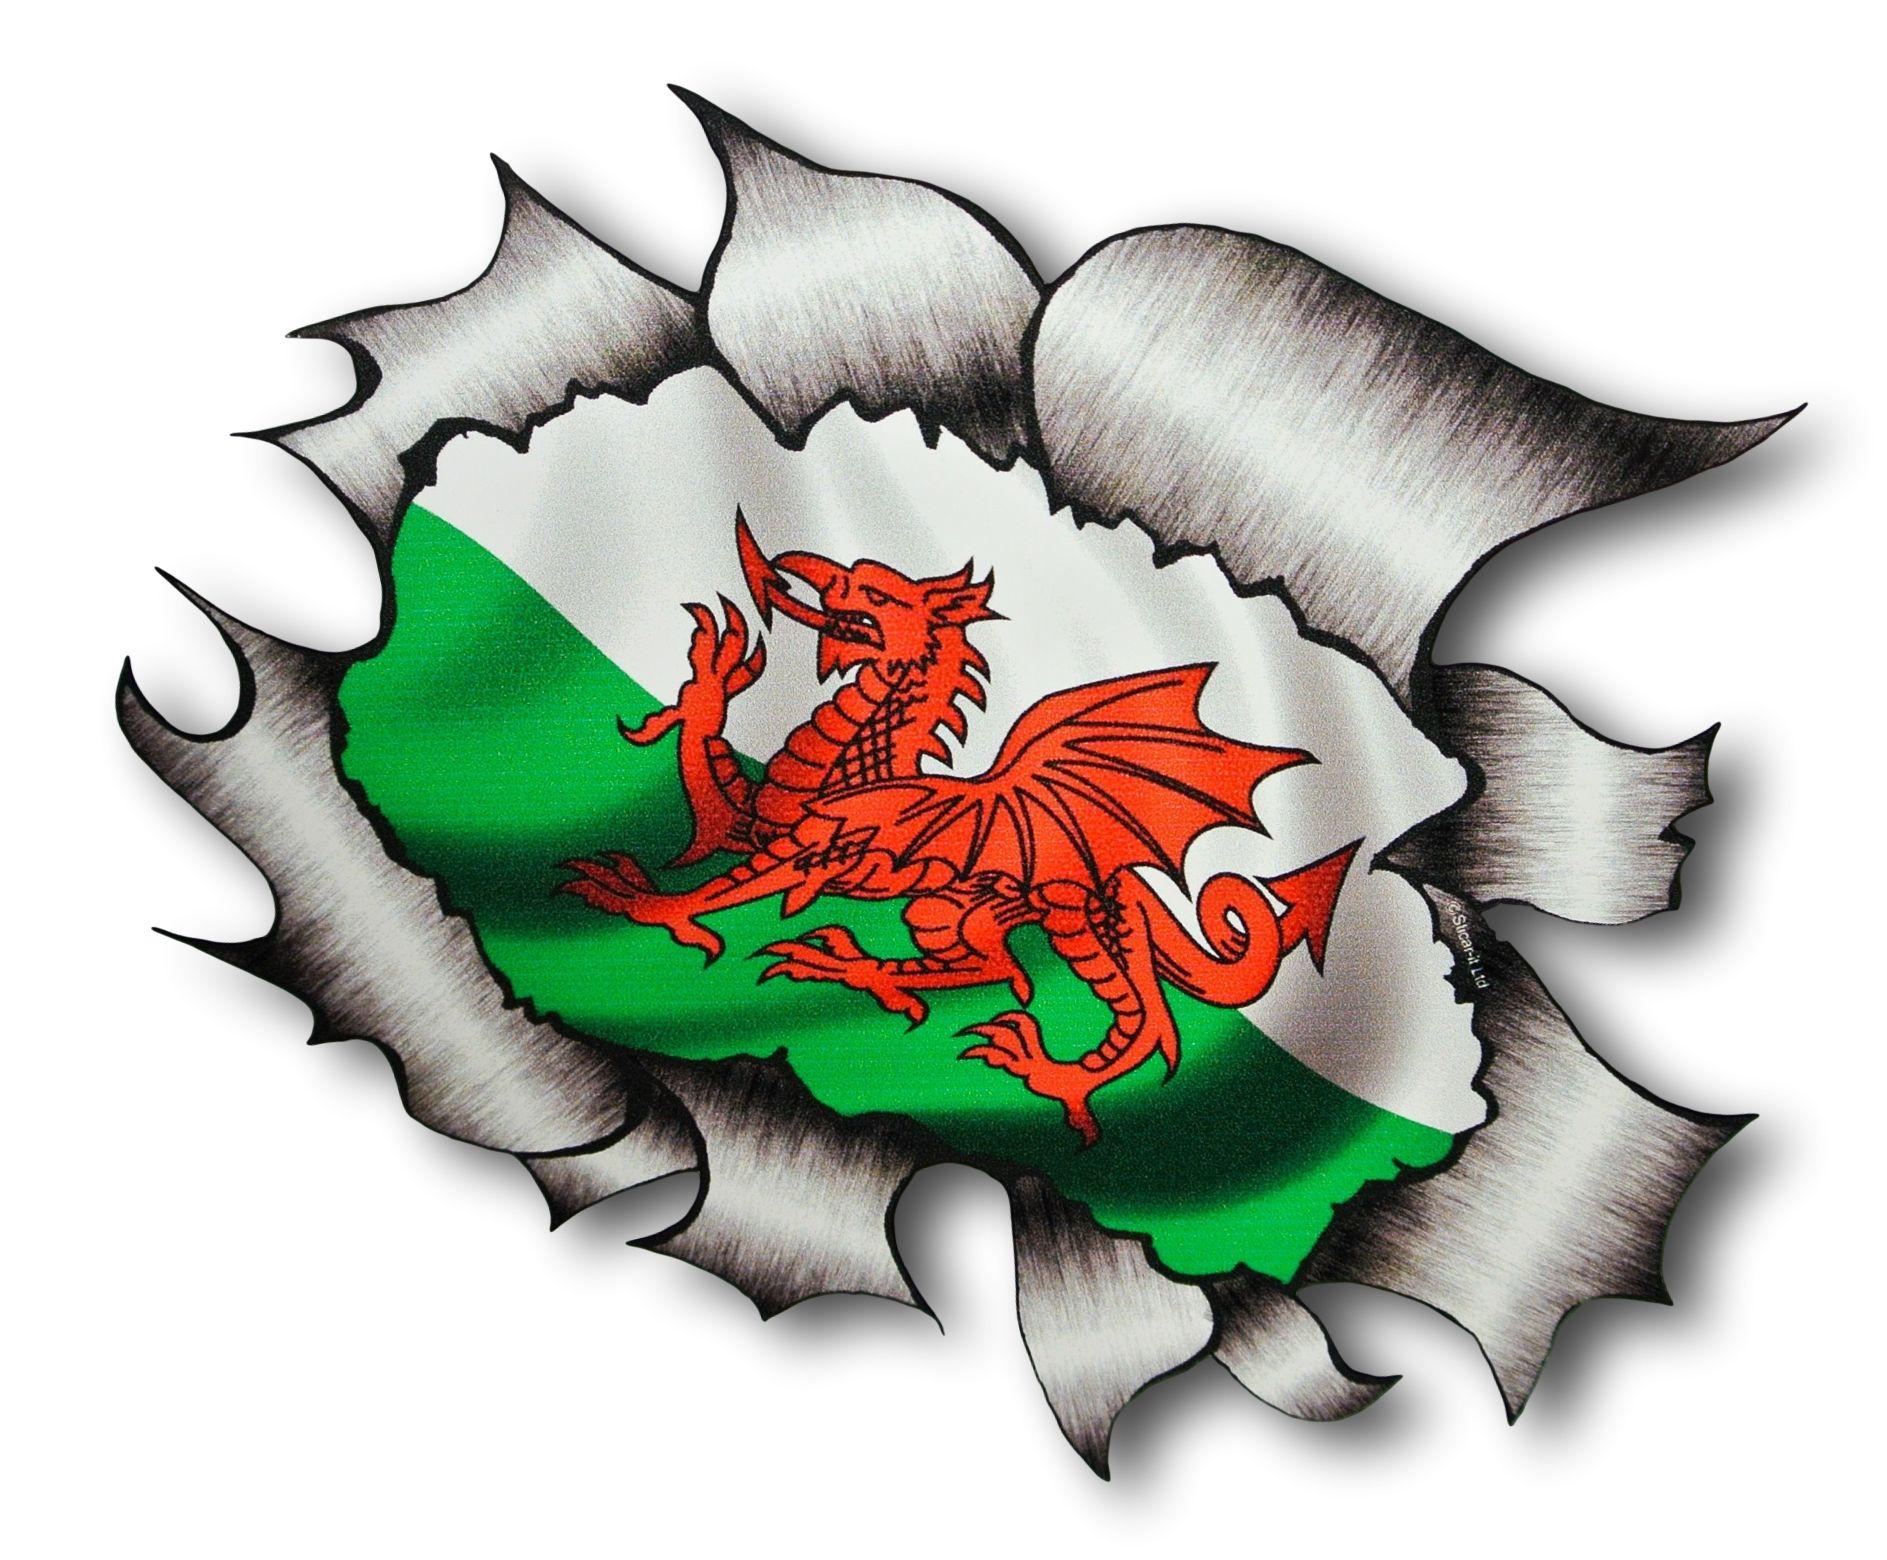 Ripped Torn Metal Design With Wales Welsh Dragon Cymru